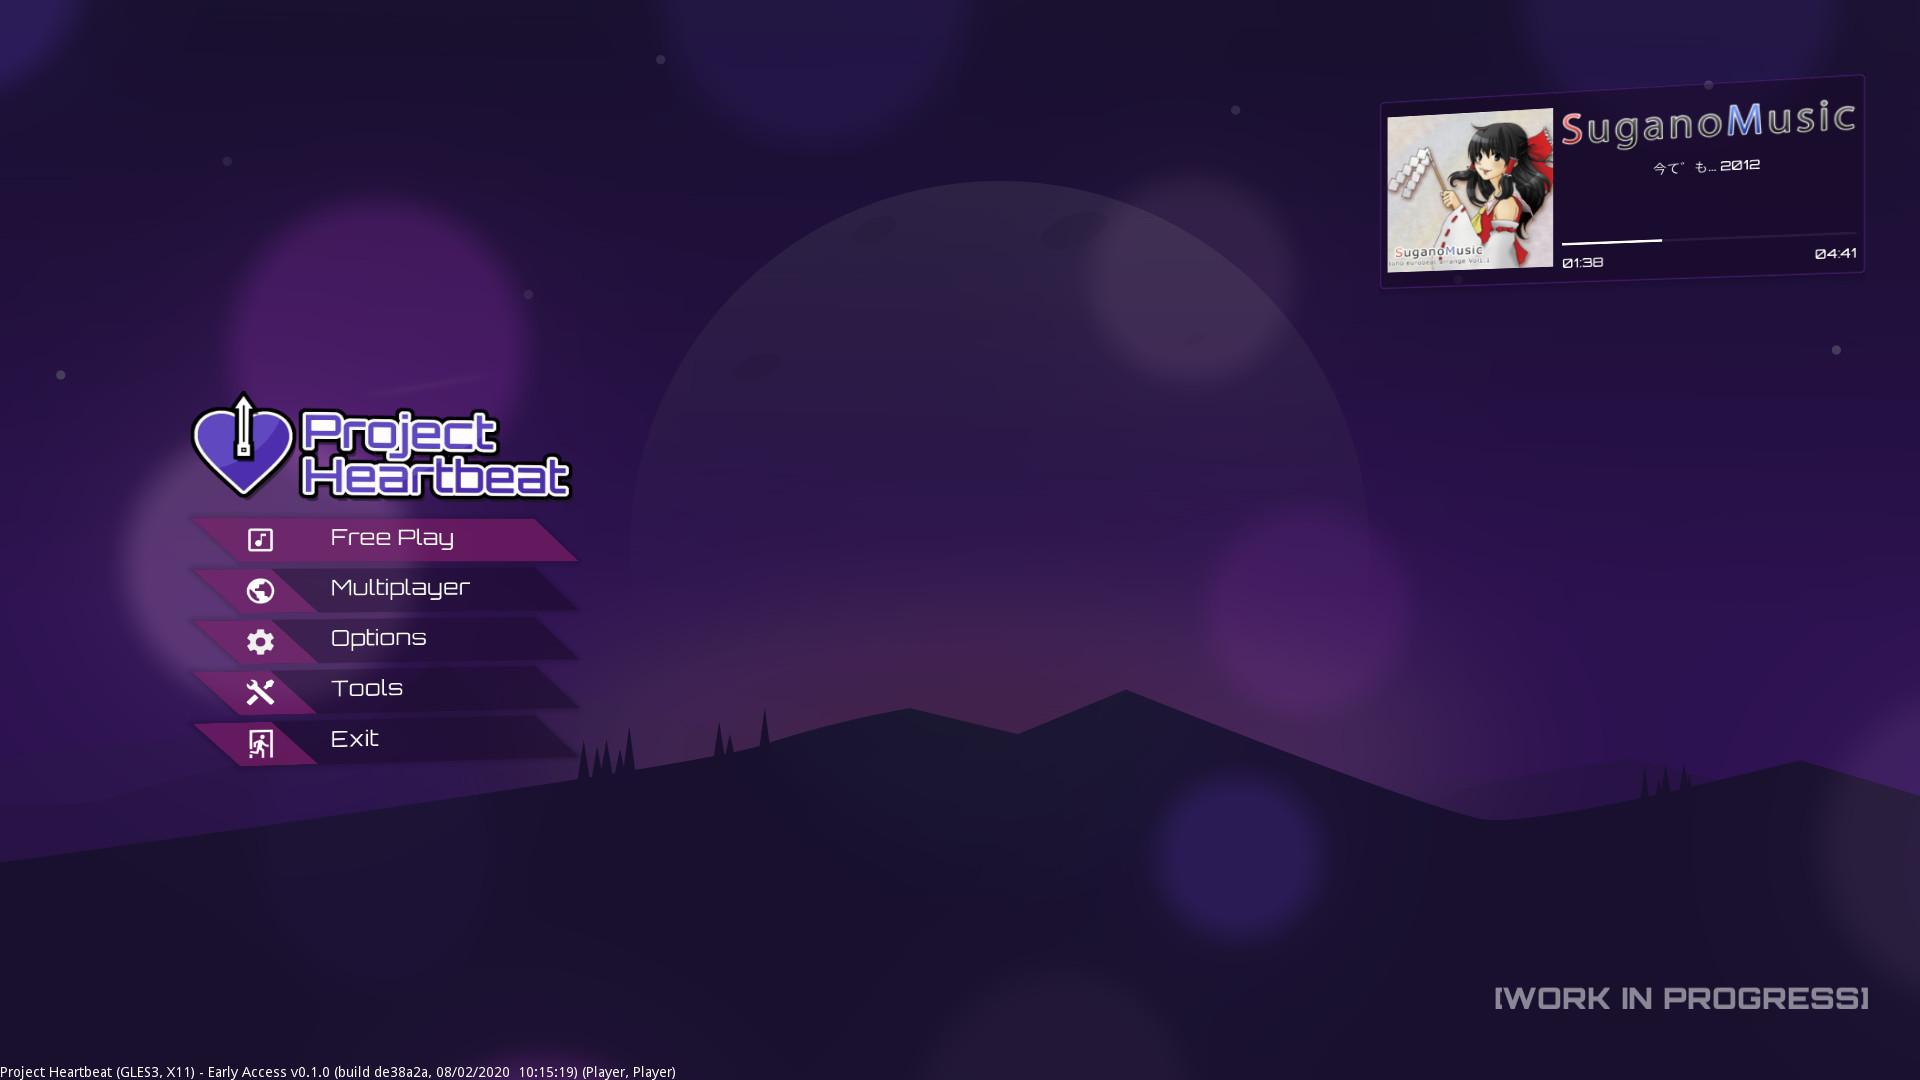 Project Heartbeat screenshot